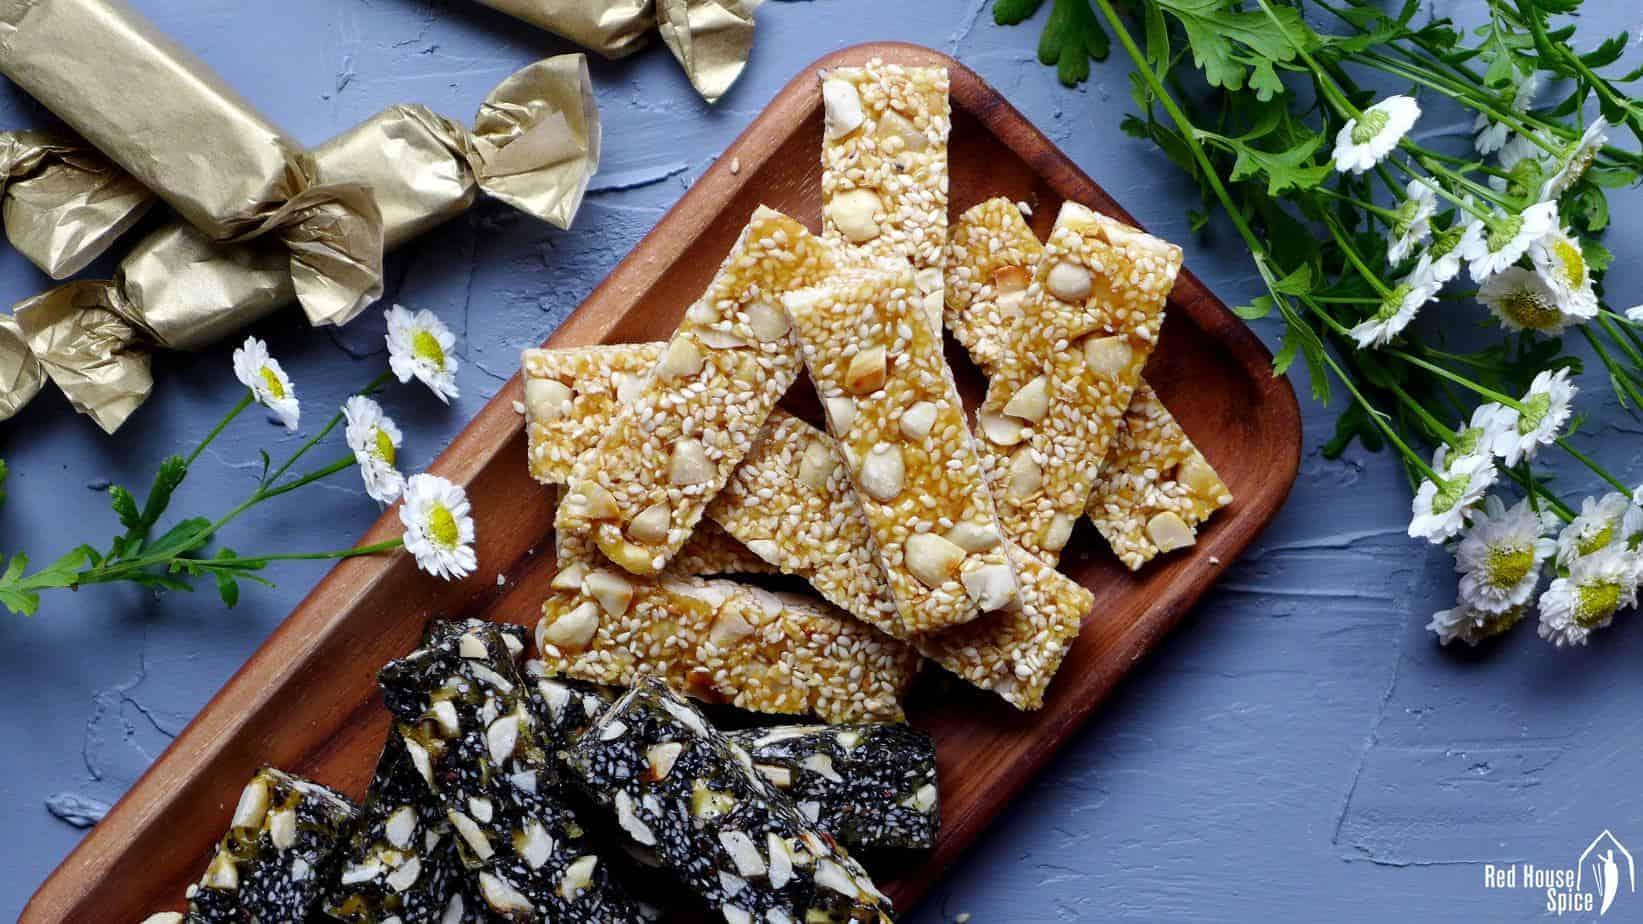 Peanut & sesame brittle (花生芝麻糖)